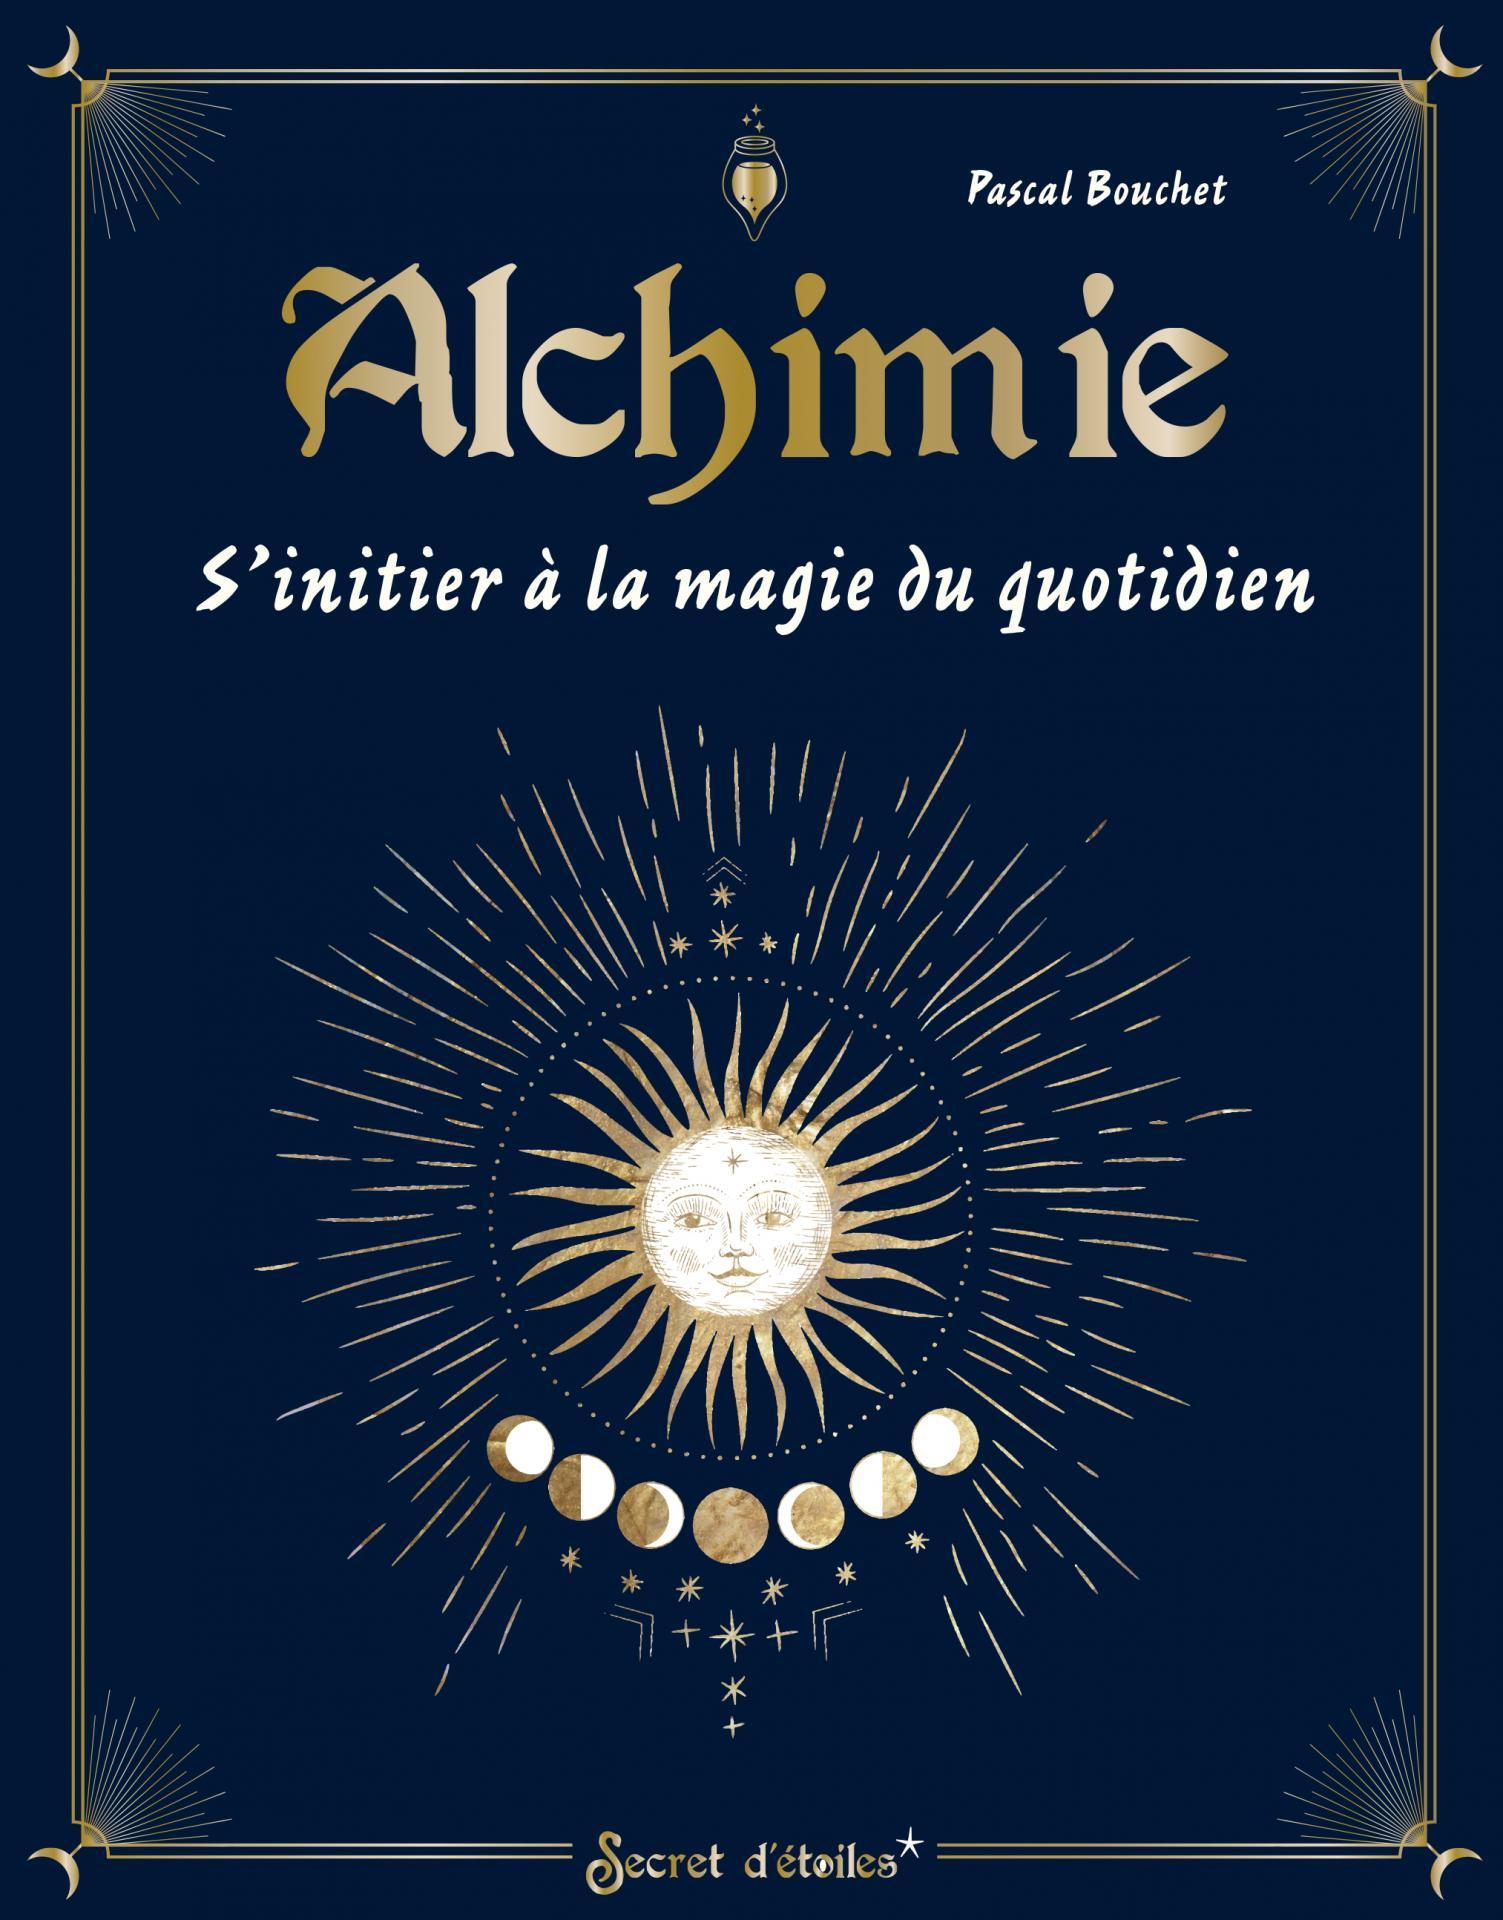 Alchimie cv jpg 1